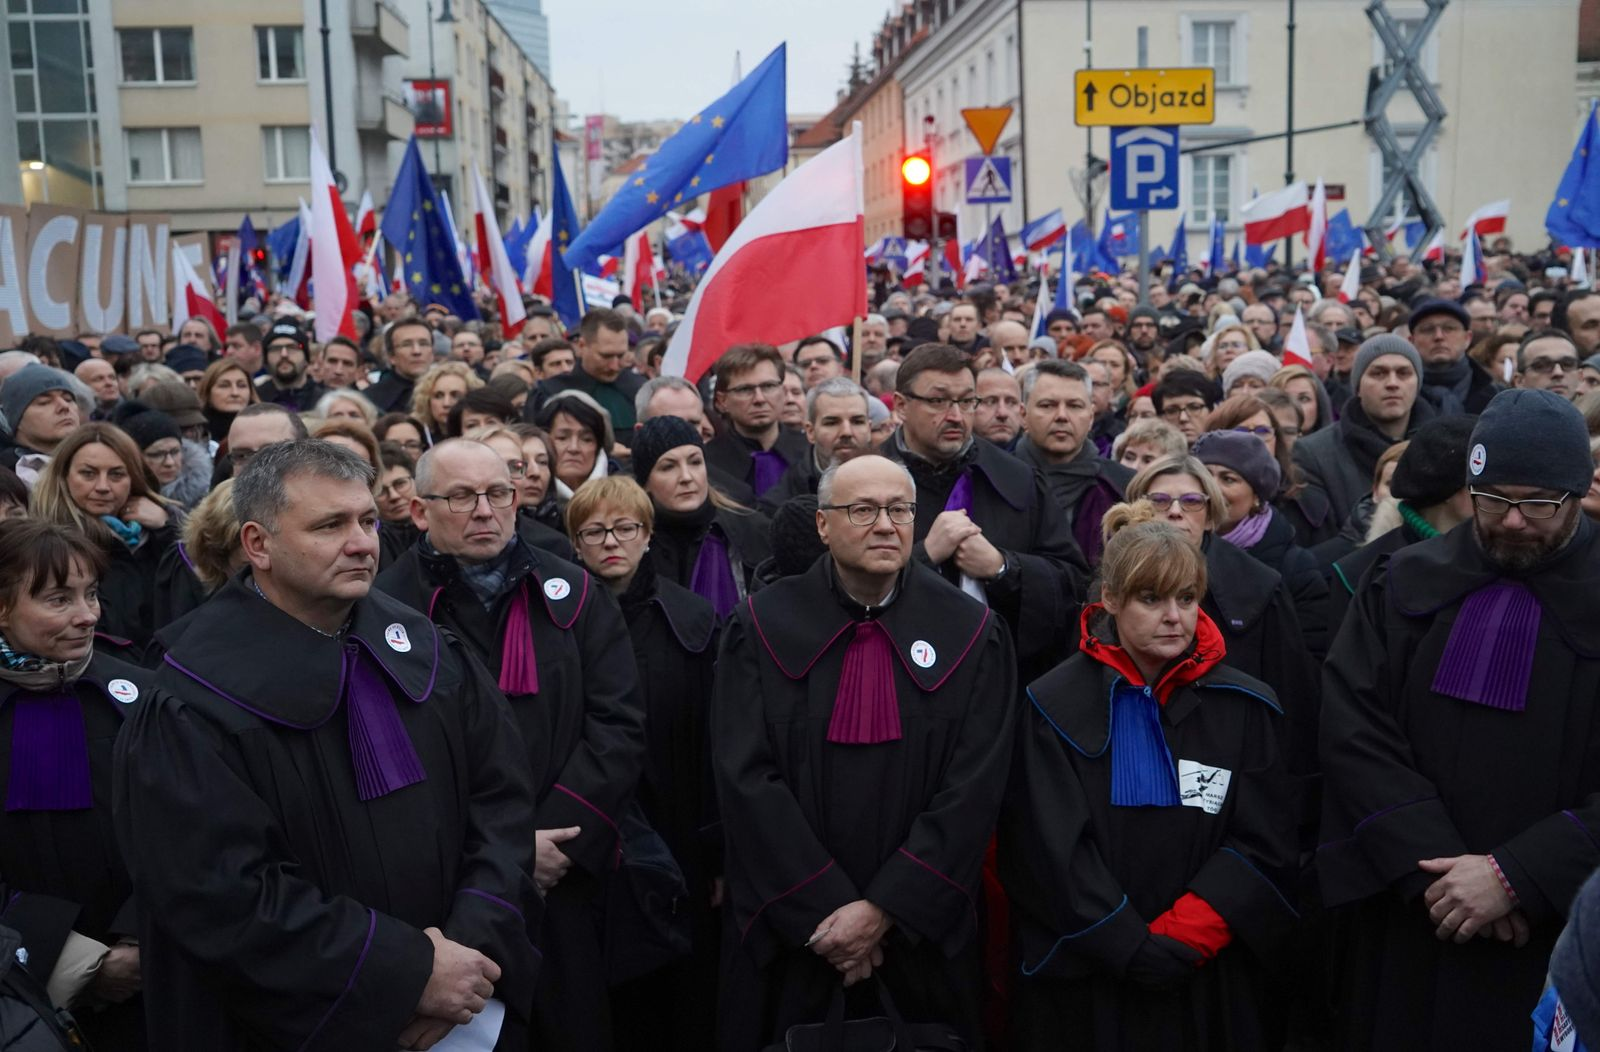 POLAND-JUSTICE-EU-POLITICS-PROTEST